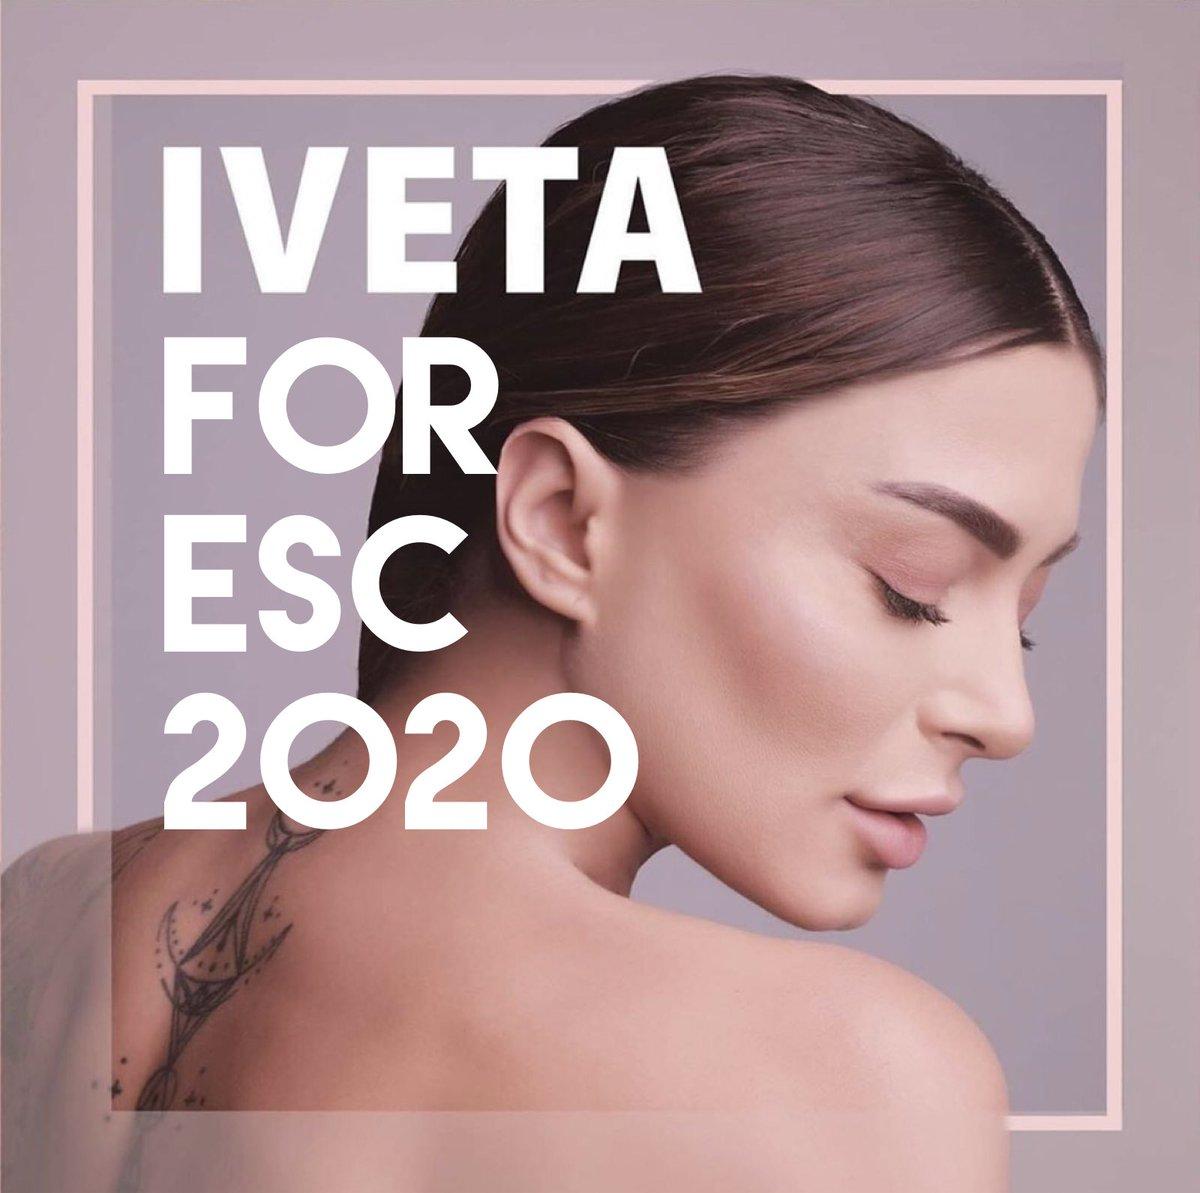 @IvetaMukuchyan for #Eurovision 2020 SHARE, REPOST!!! #IvetaforEurovision2020 #ivetamukuchyan @davidtserunyan @wiwibloggs @WilliamLeeAdams @DebanAderemi @ArmPublicTV @Armenia_In_ESC @Eurovisionpic.twitter.com/1uVHErHjLE